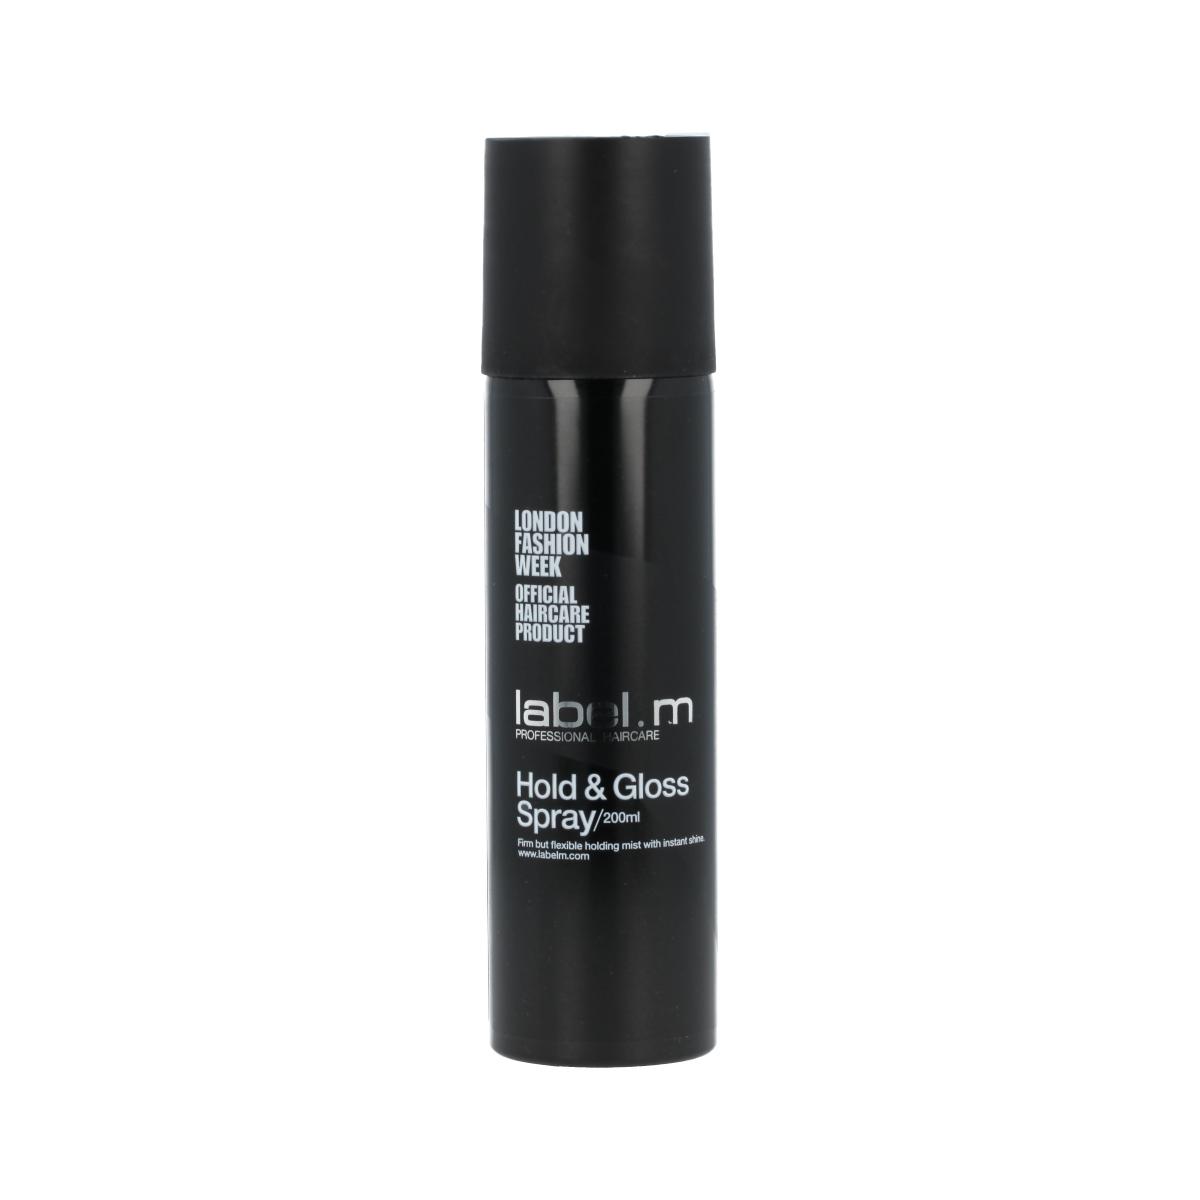 Label.m Hold & Gloss Spray 200 ml